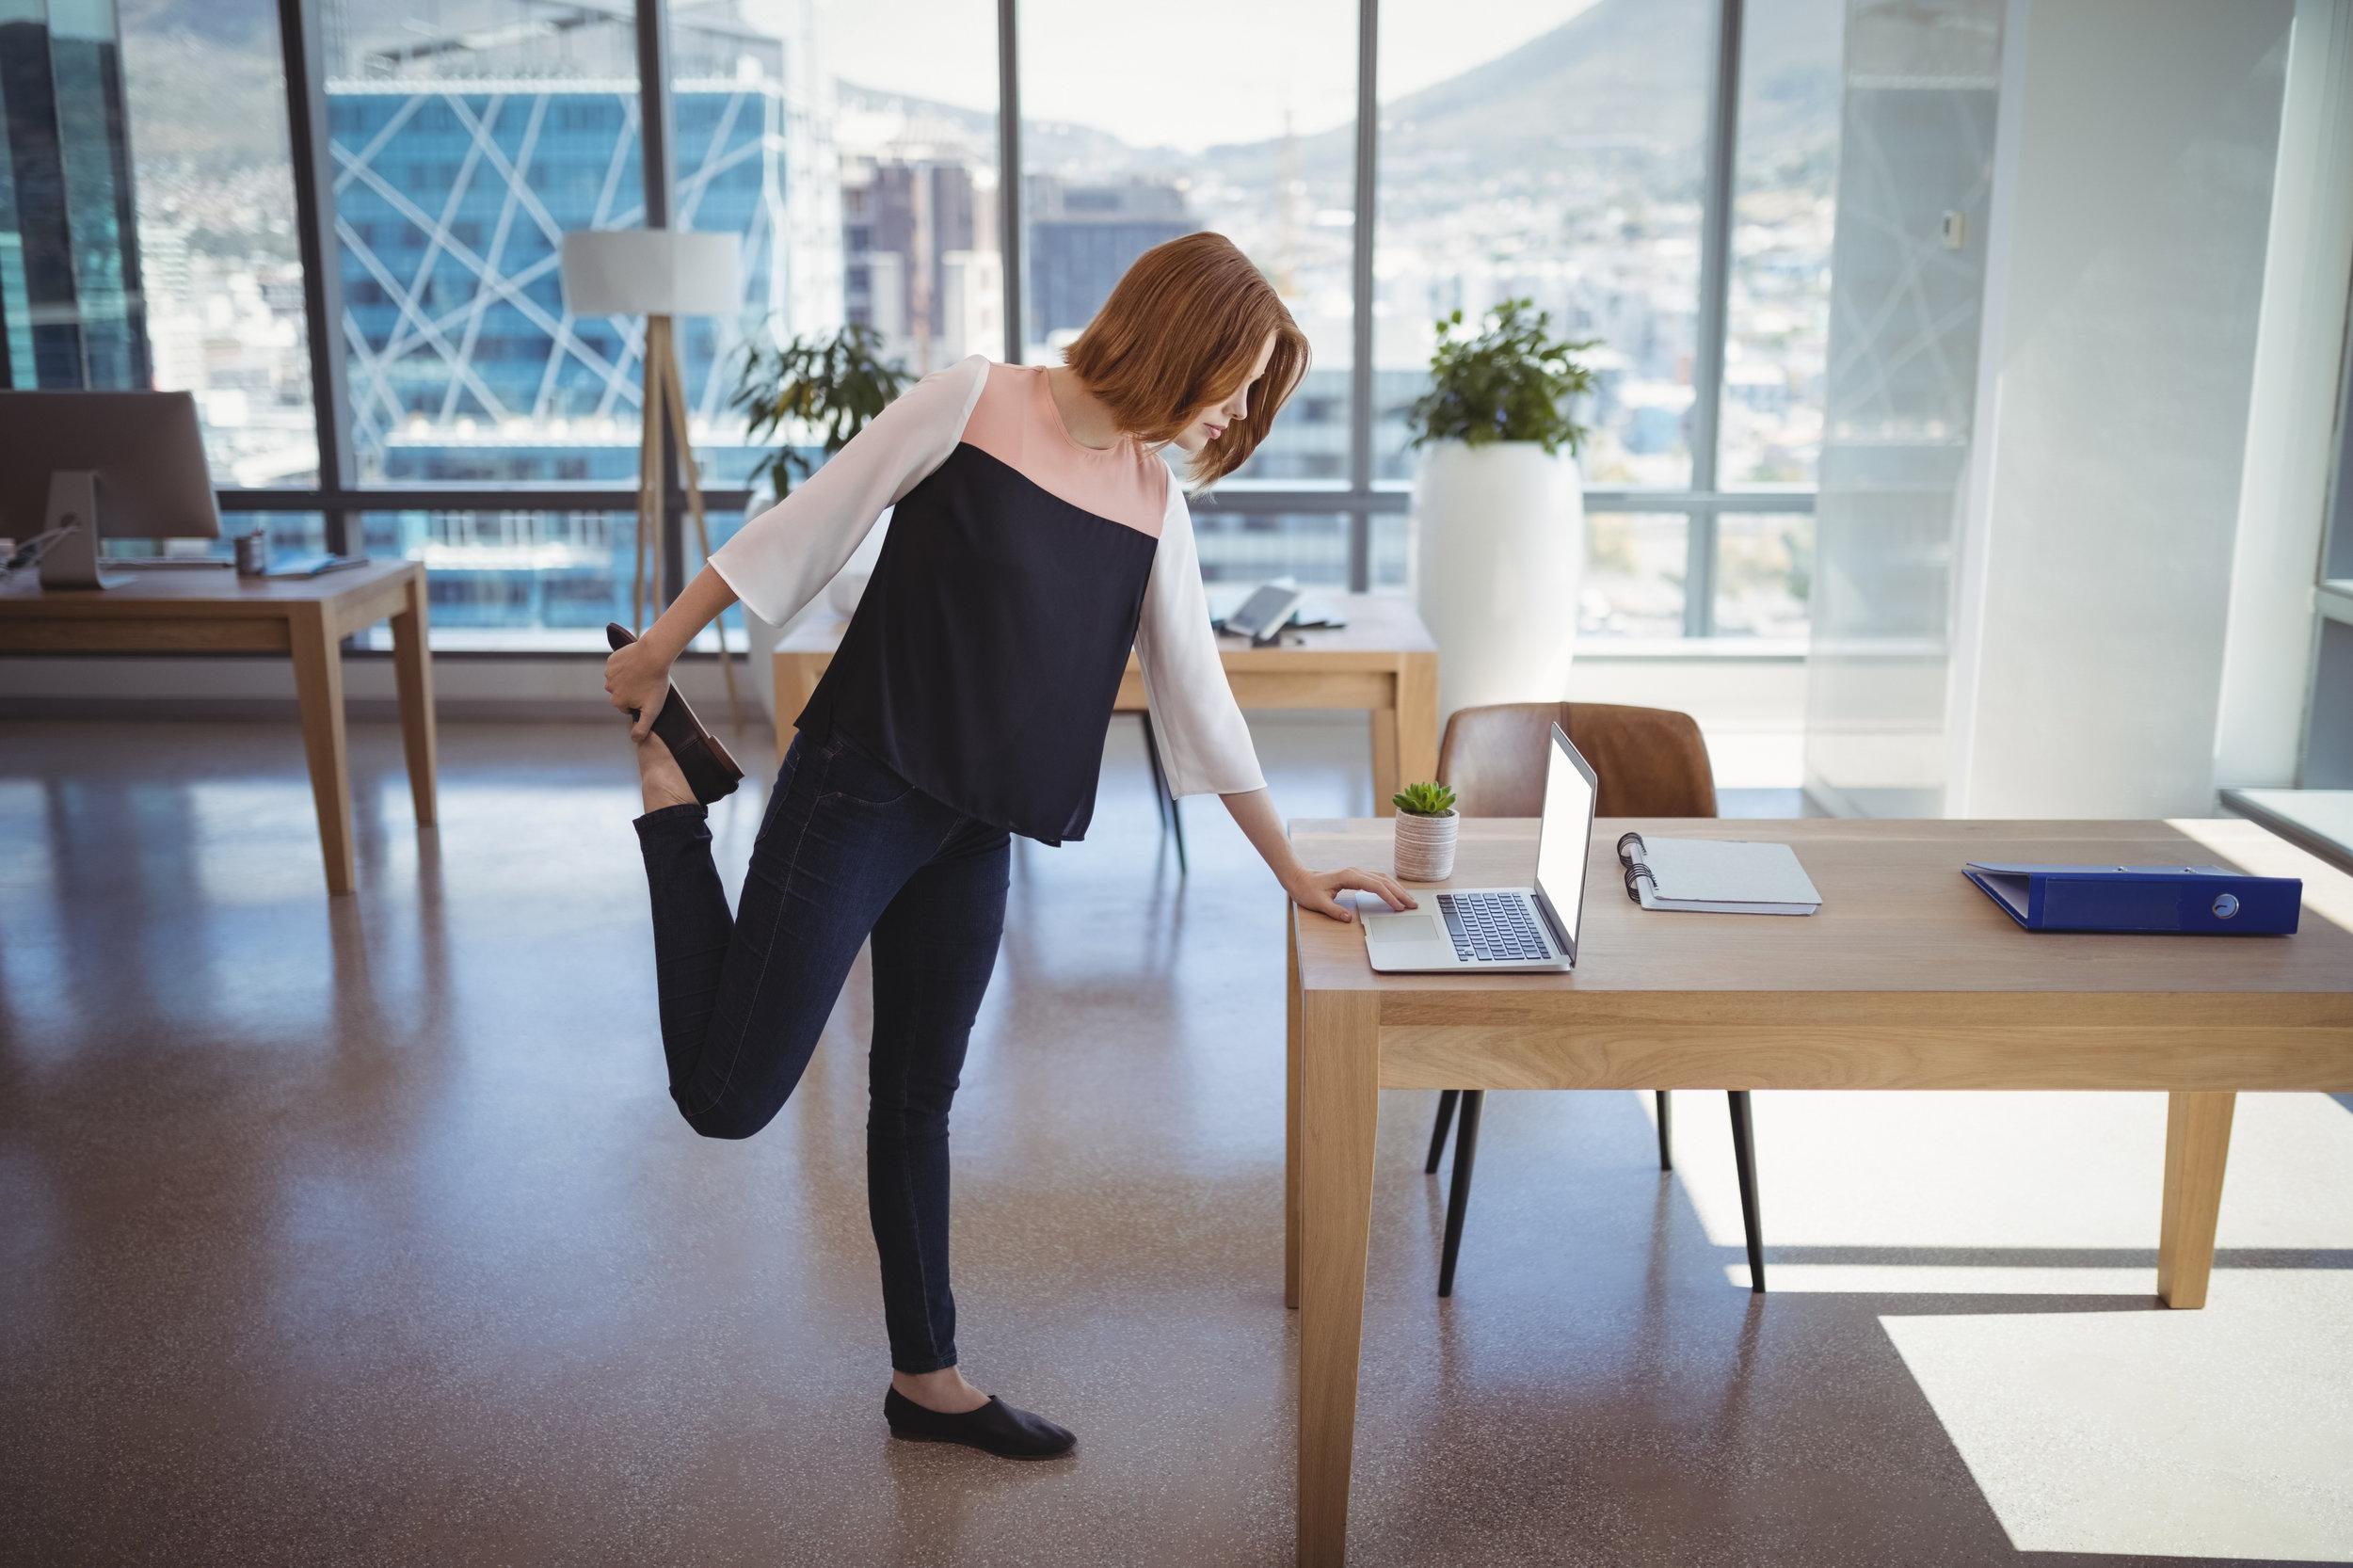 BWFS Image Woman stretching by desk.jpg